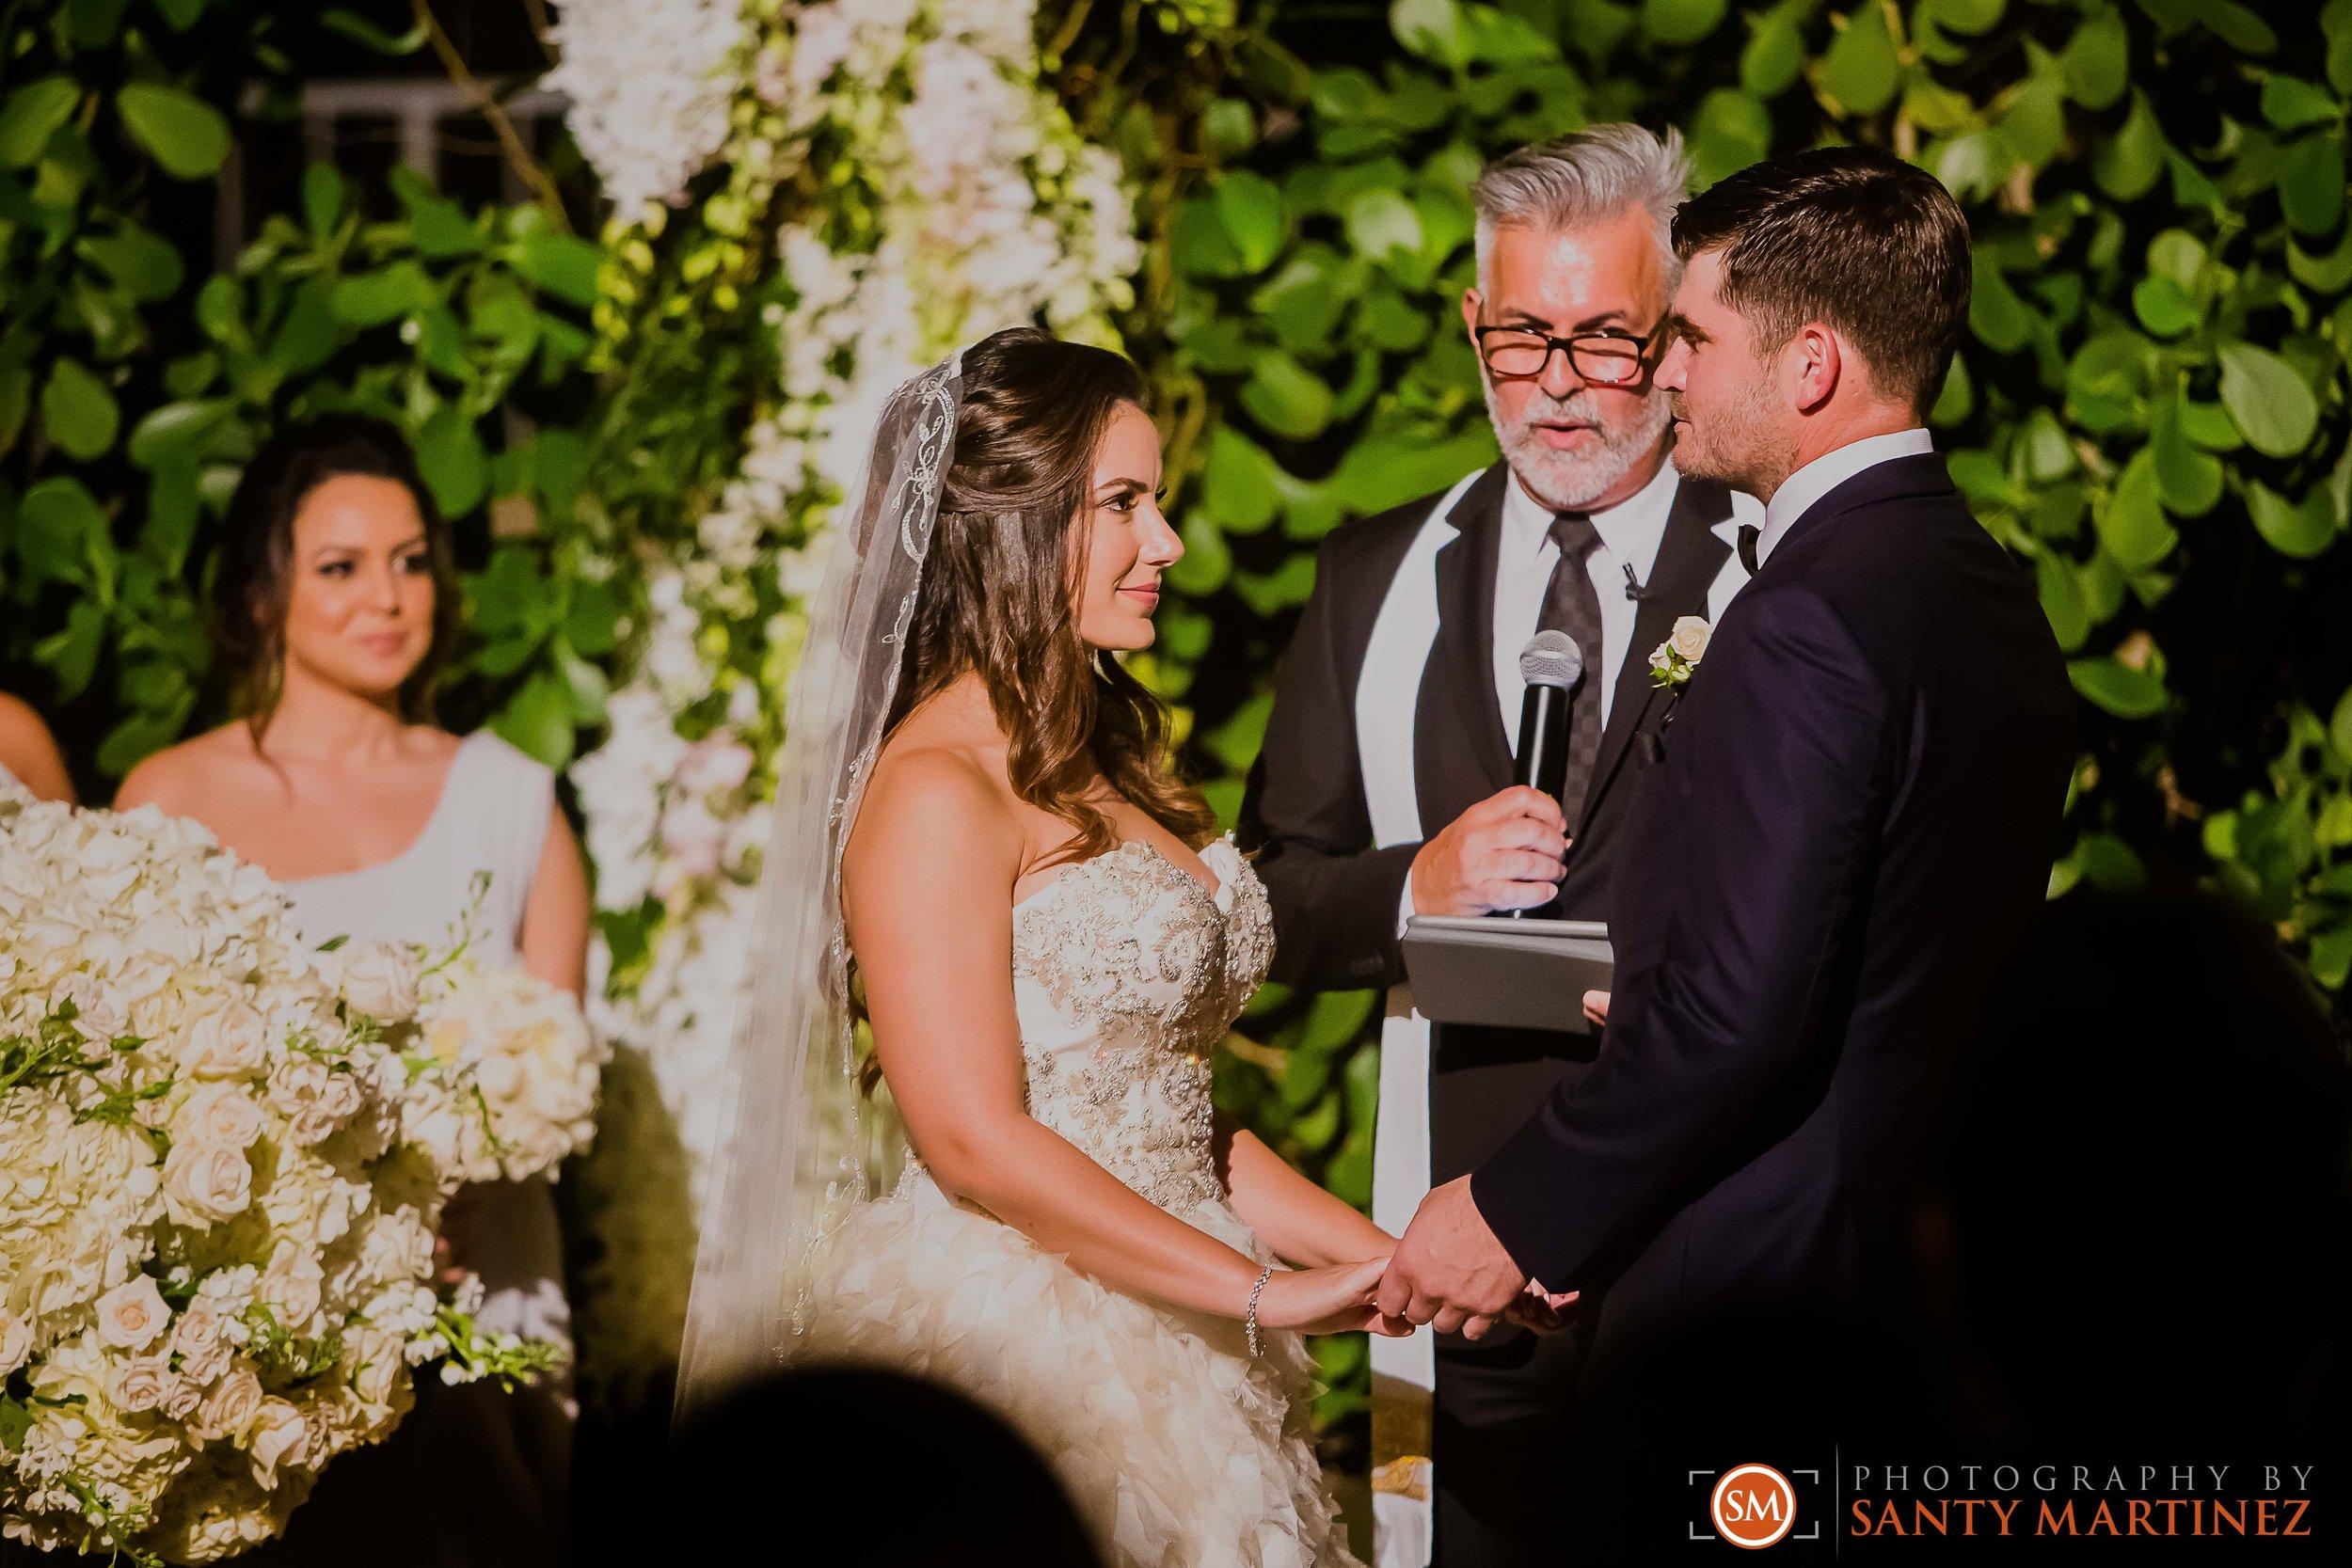 Wedding Coral Gables Country Club - Santy Martinez Photography-25.jpg